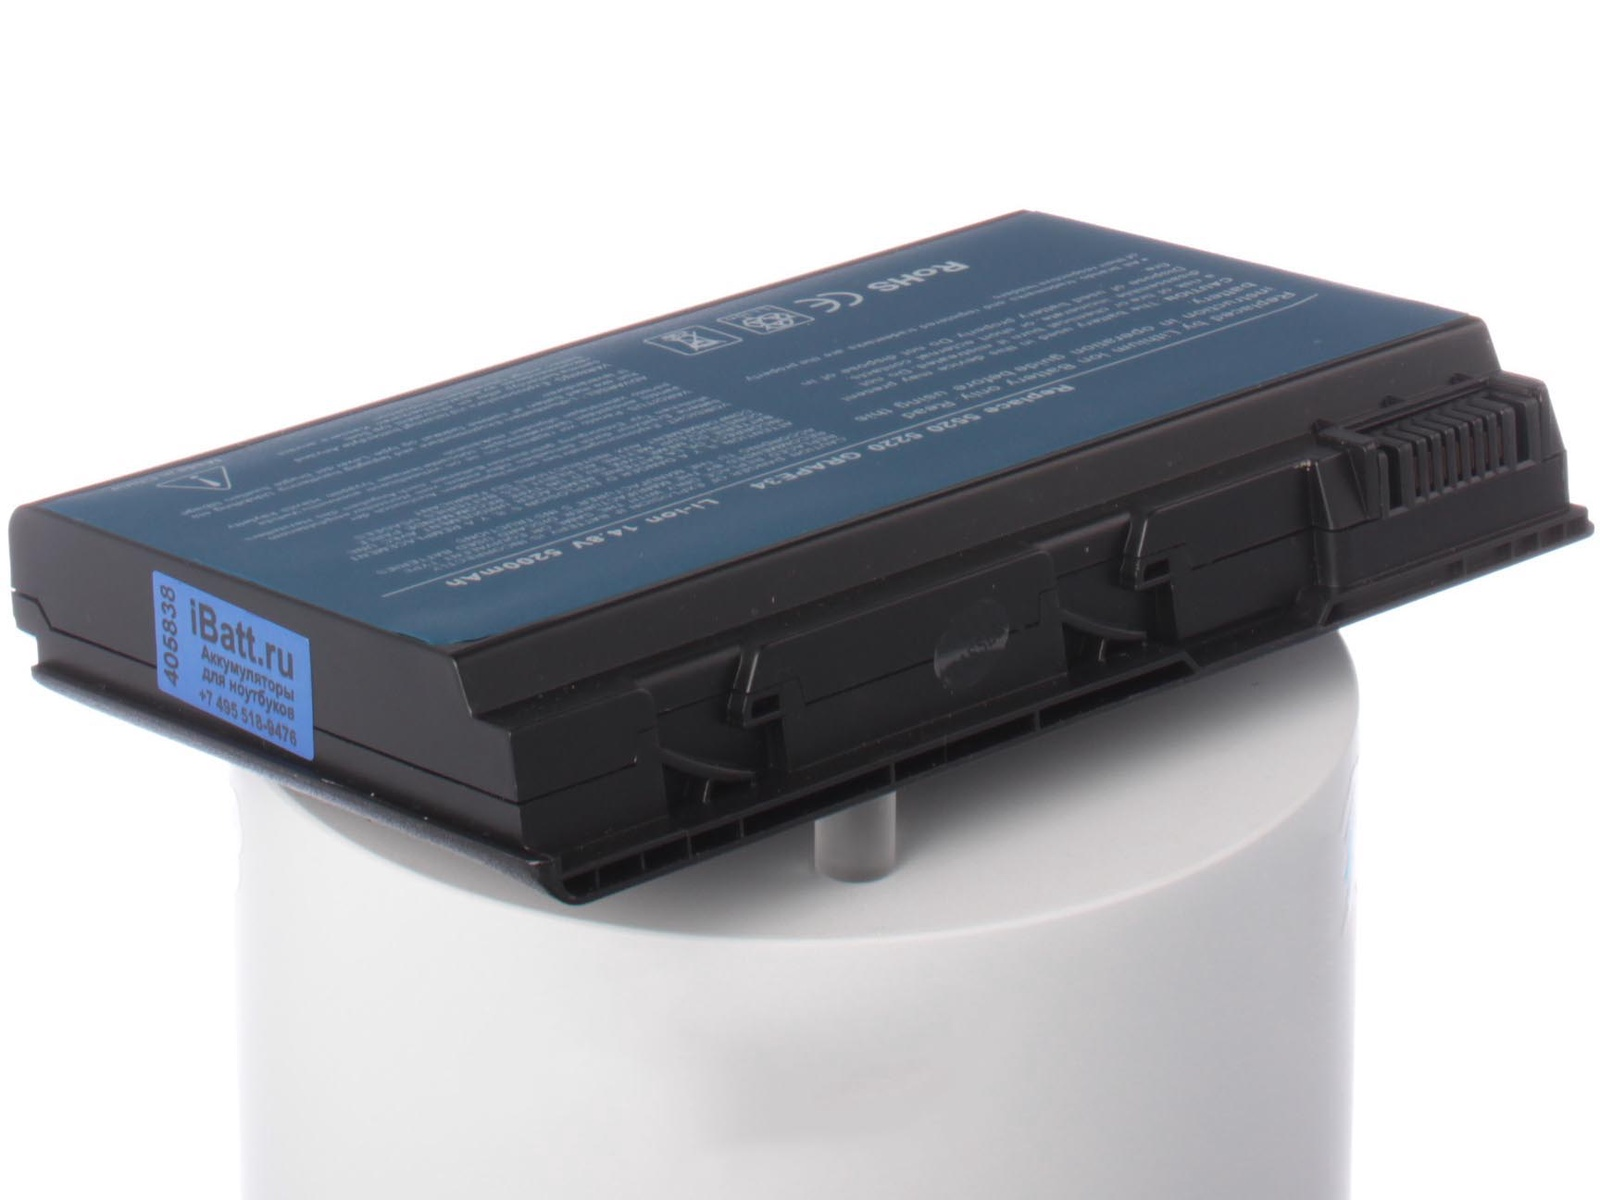 Аккумулятор для ноутбука iBatt для Acer Extensa 5610, TravelMate 5720G, Extensa 7620, Travelmate 6592, Extensa 5230E, Extensa 5230, Extensa 5200, TravelMate 5520, Extensa 5630Z, TravelMate 5730, TravelMate 5520G, Extensa 5510 цены